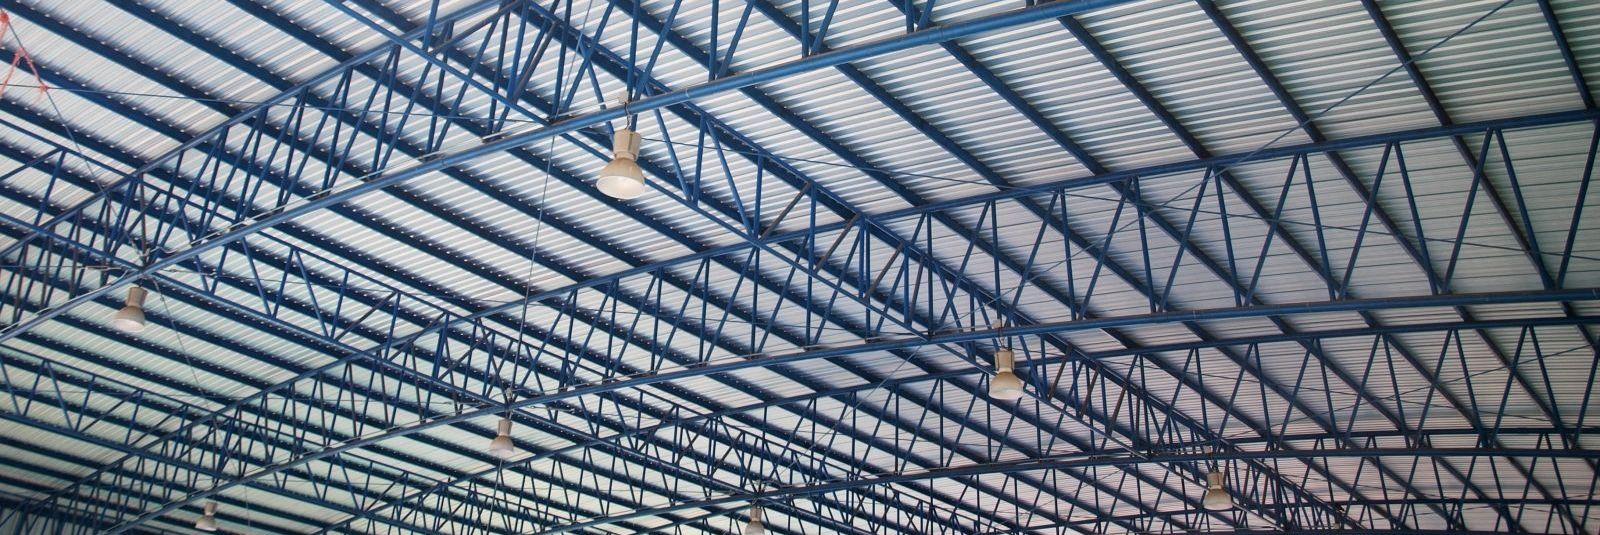 LEXAN Corrugated Sheet - High Insulation